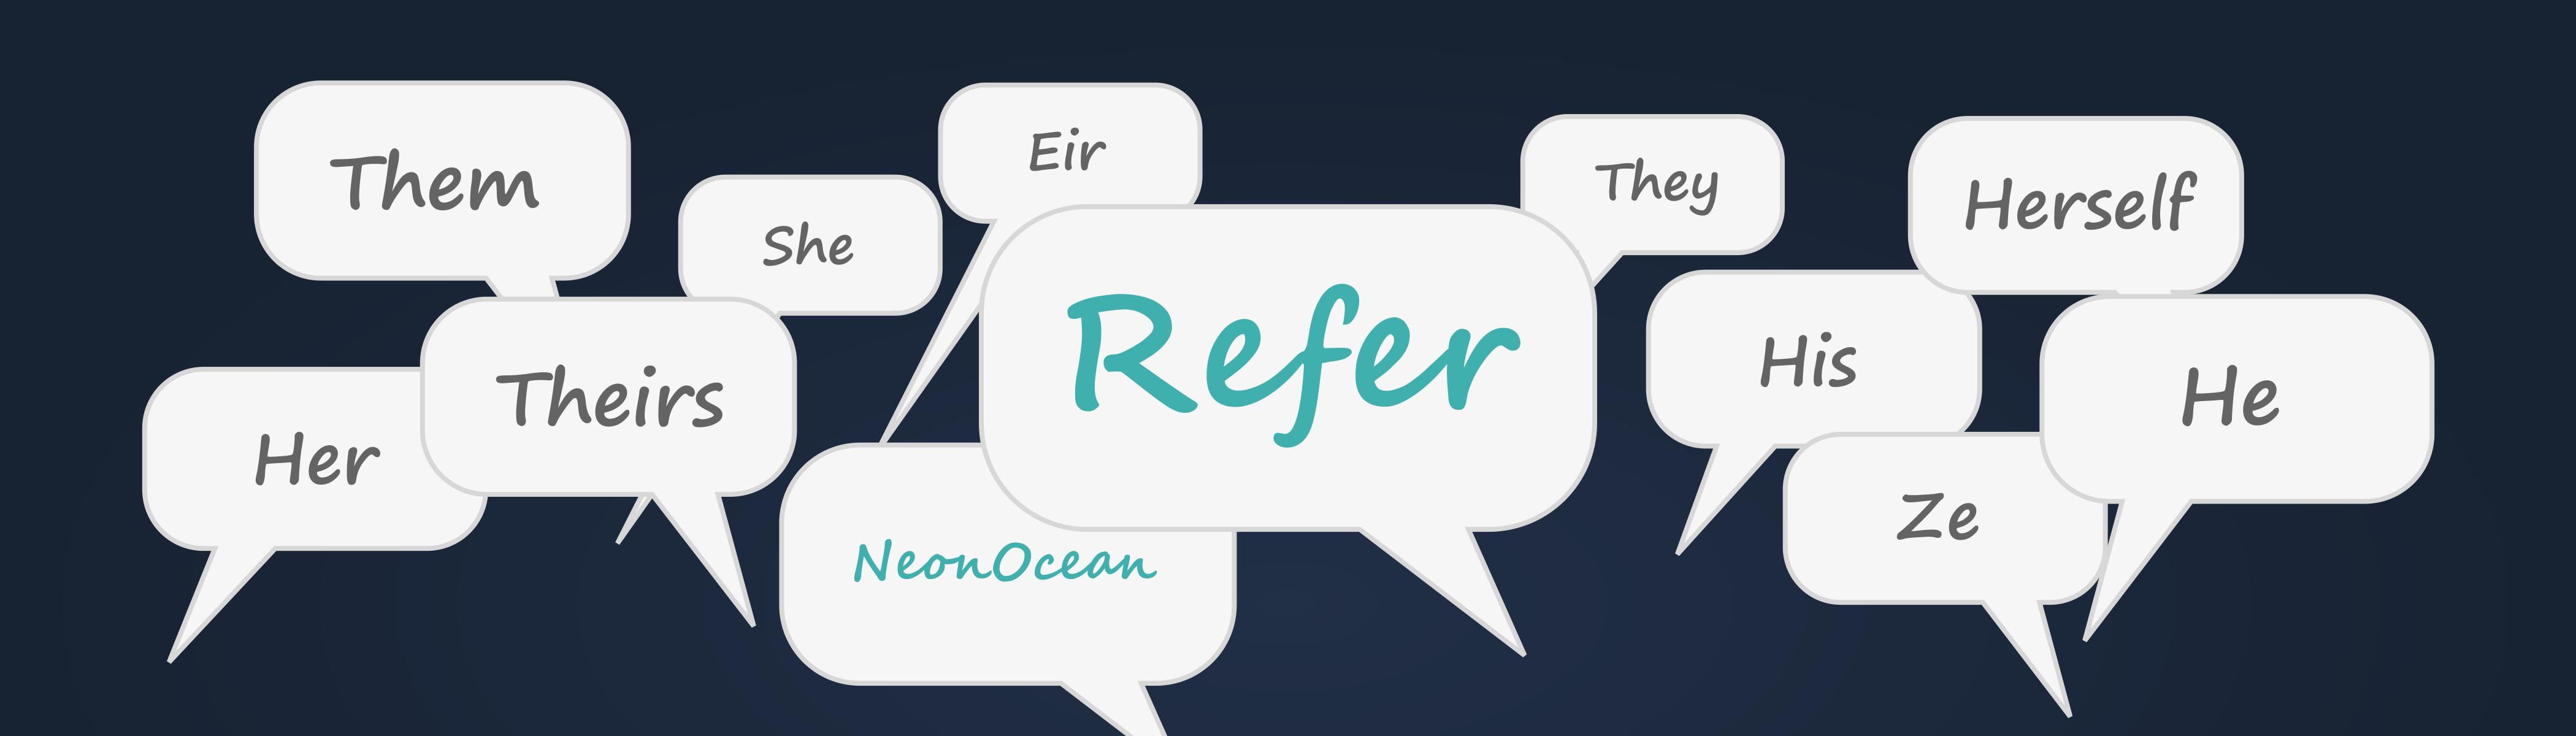 Refer Non Binary Pronouns Sims 4 Custom Content Gender Neutral Pronouns My Sims